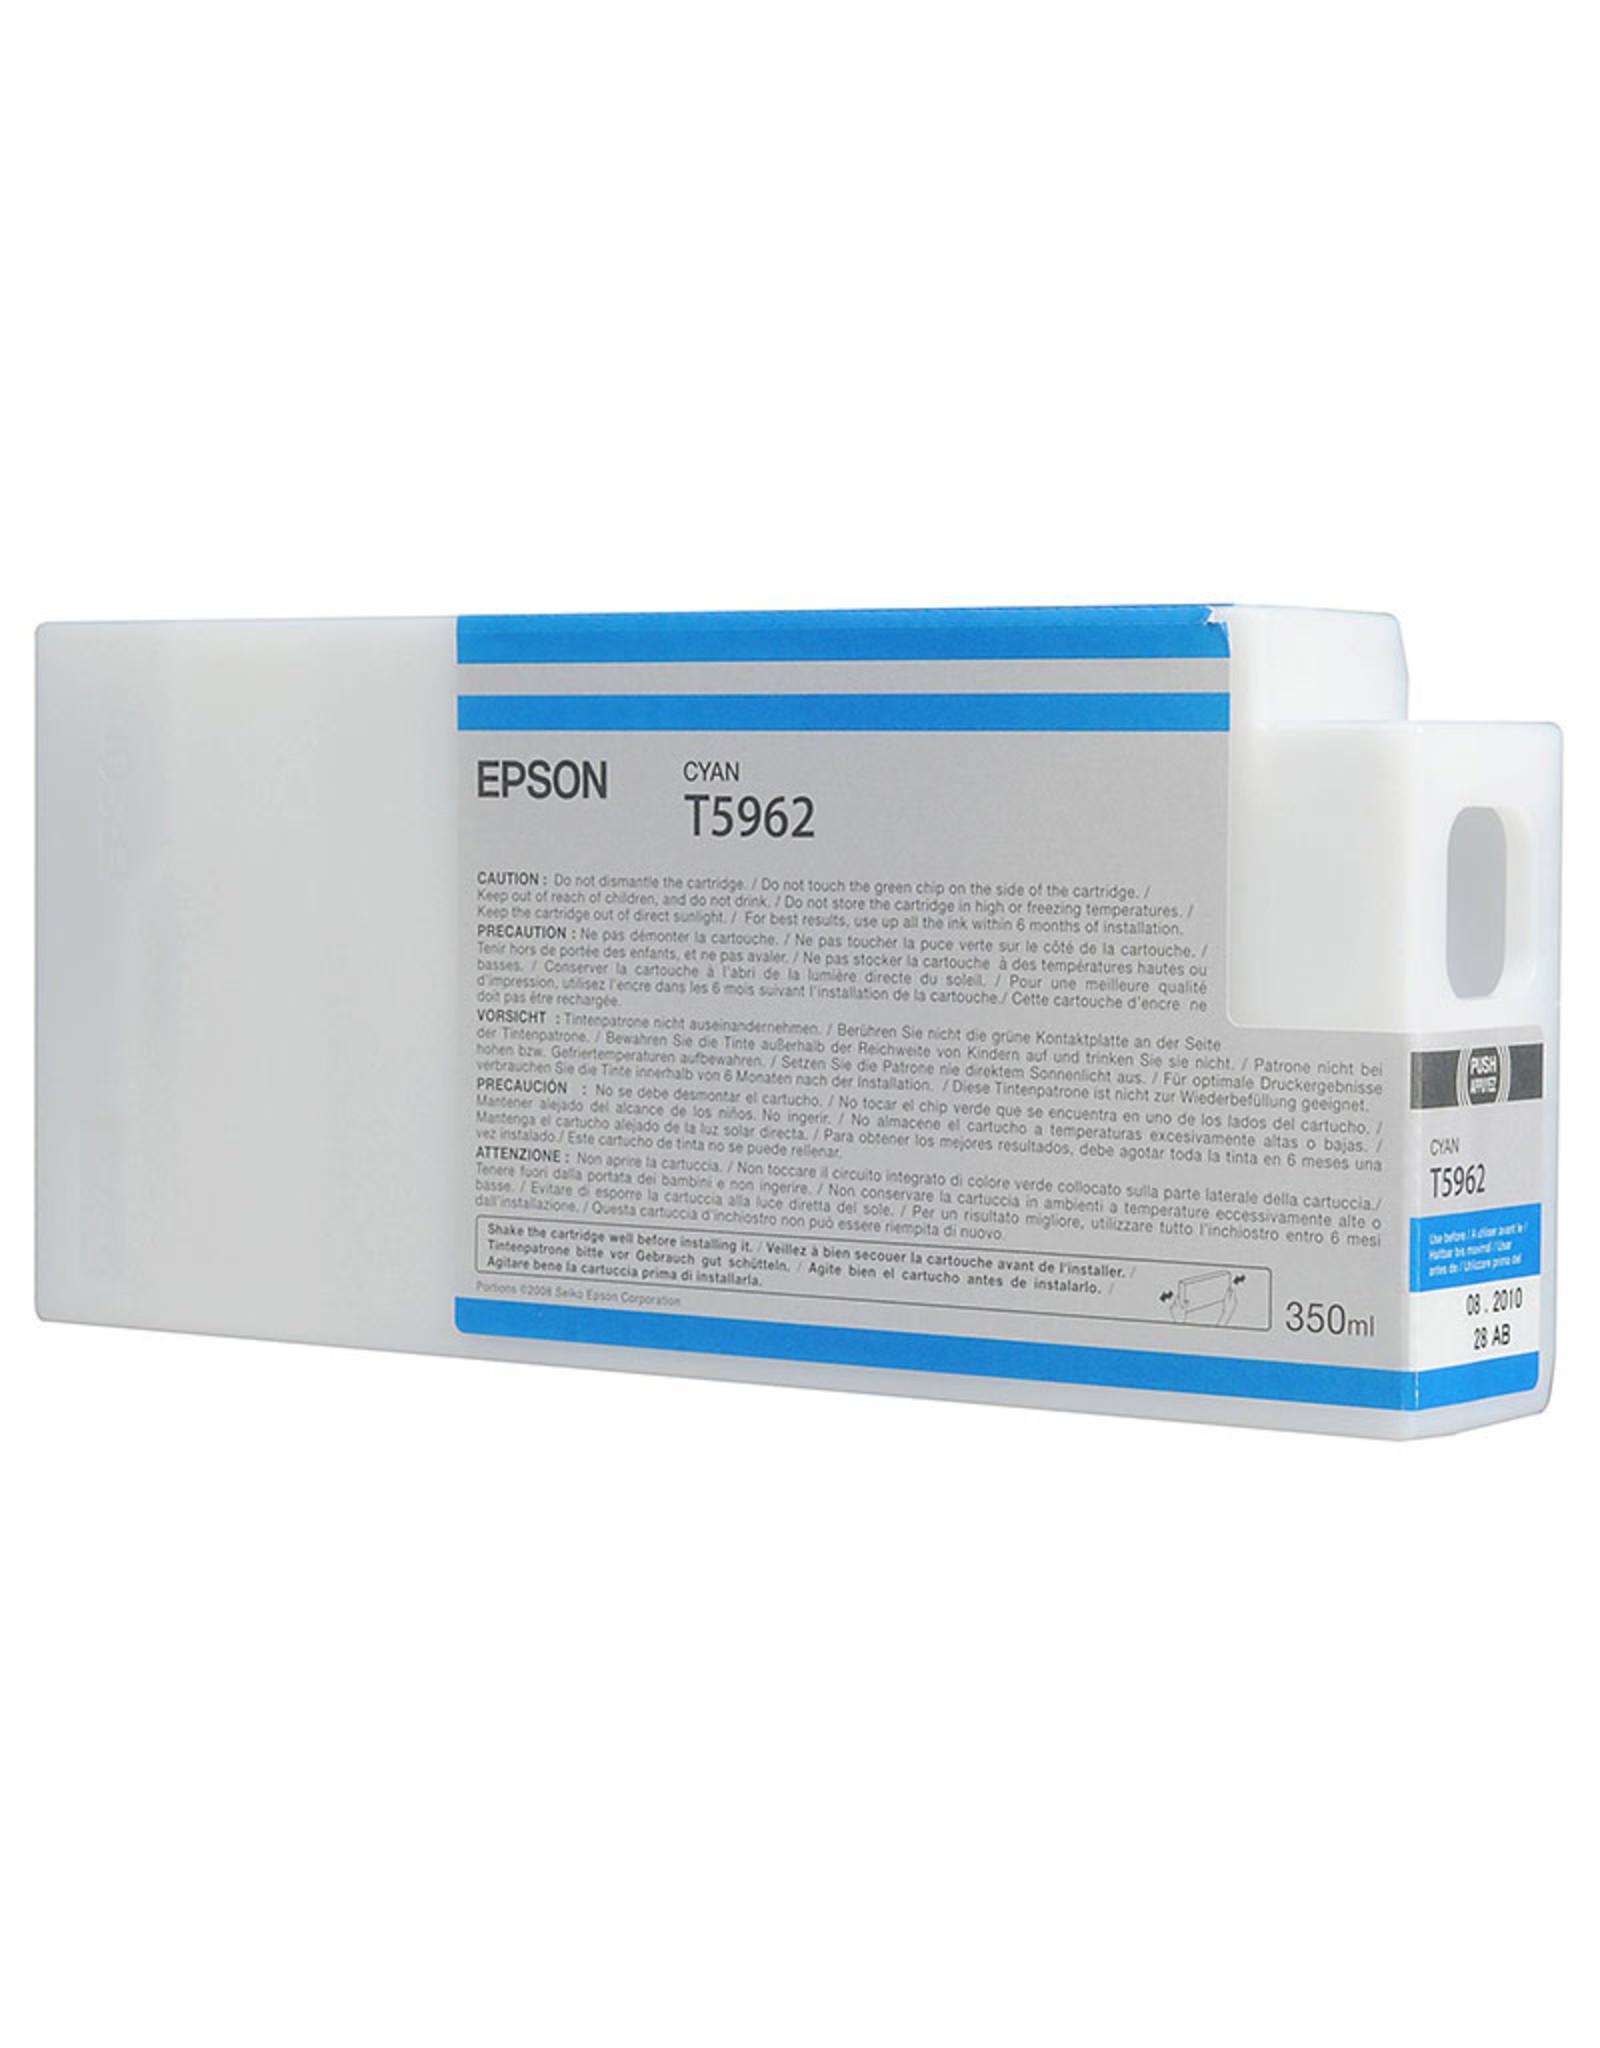 Epson Epson Cyan Ultrachrome HDR Ink for 9900 350ml cartridges